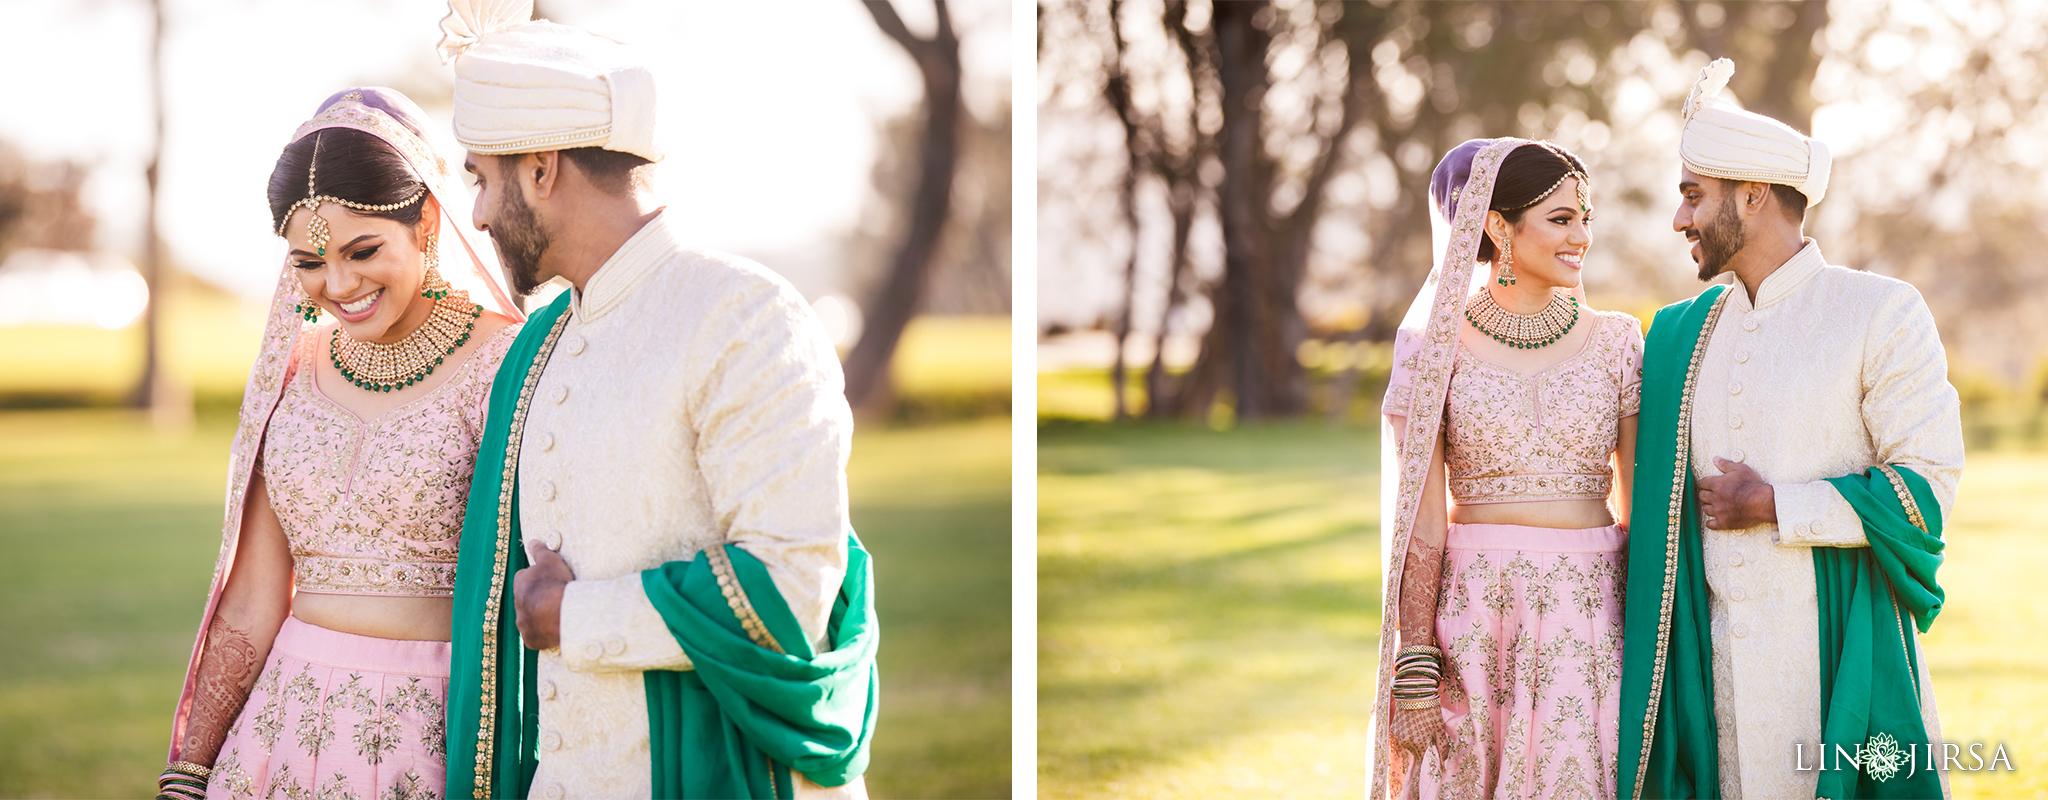 14 Laguna Cliffs Marriott Indian Wedding Photography